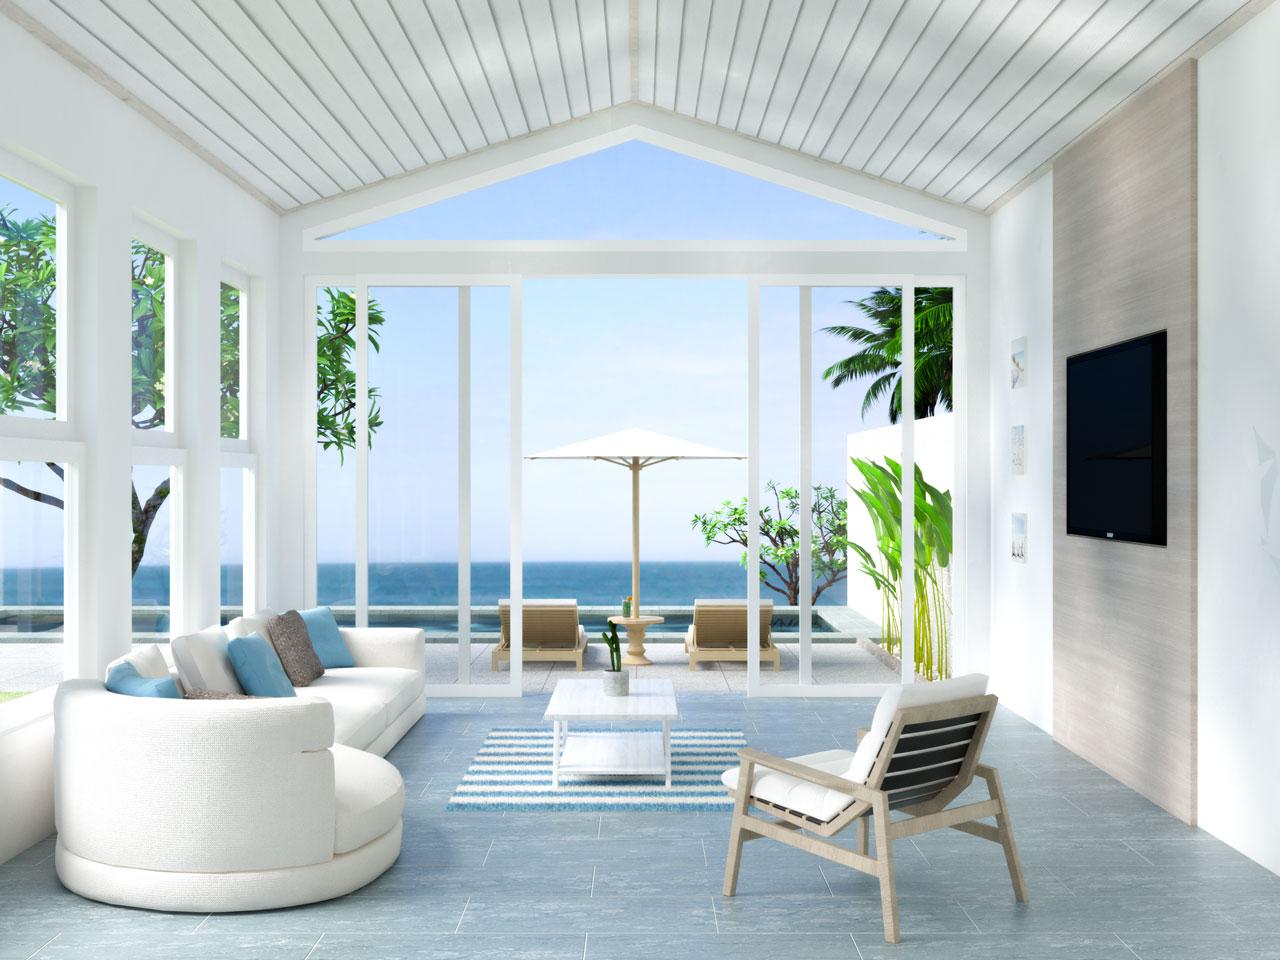 Beach house living room with blue tile flooring